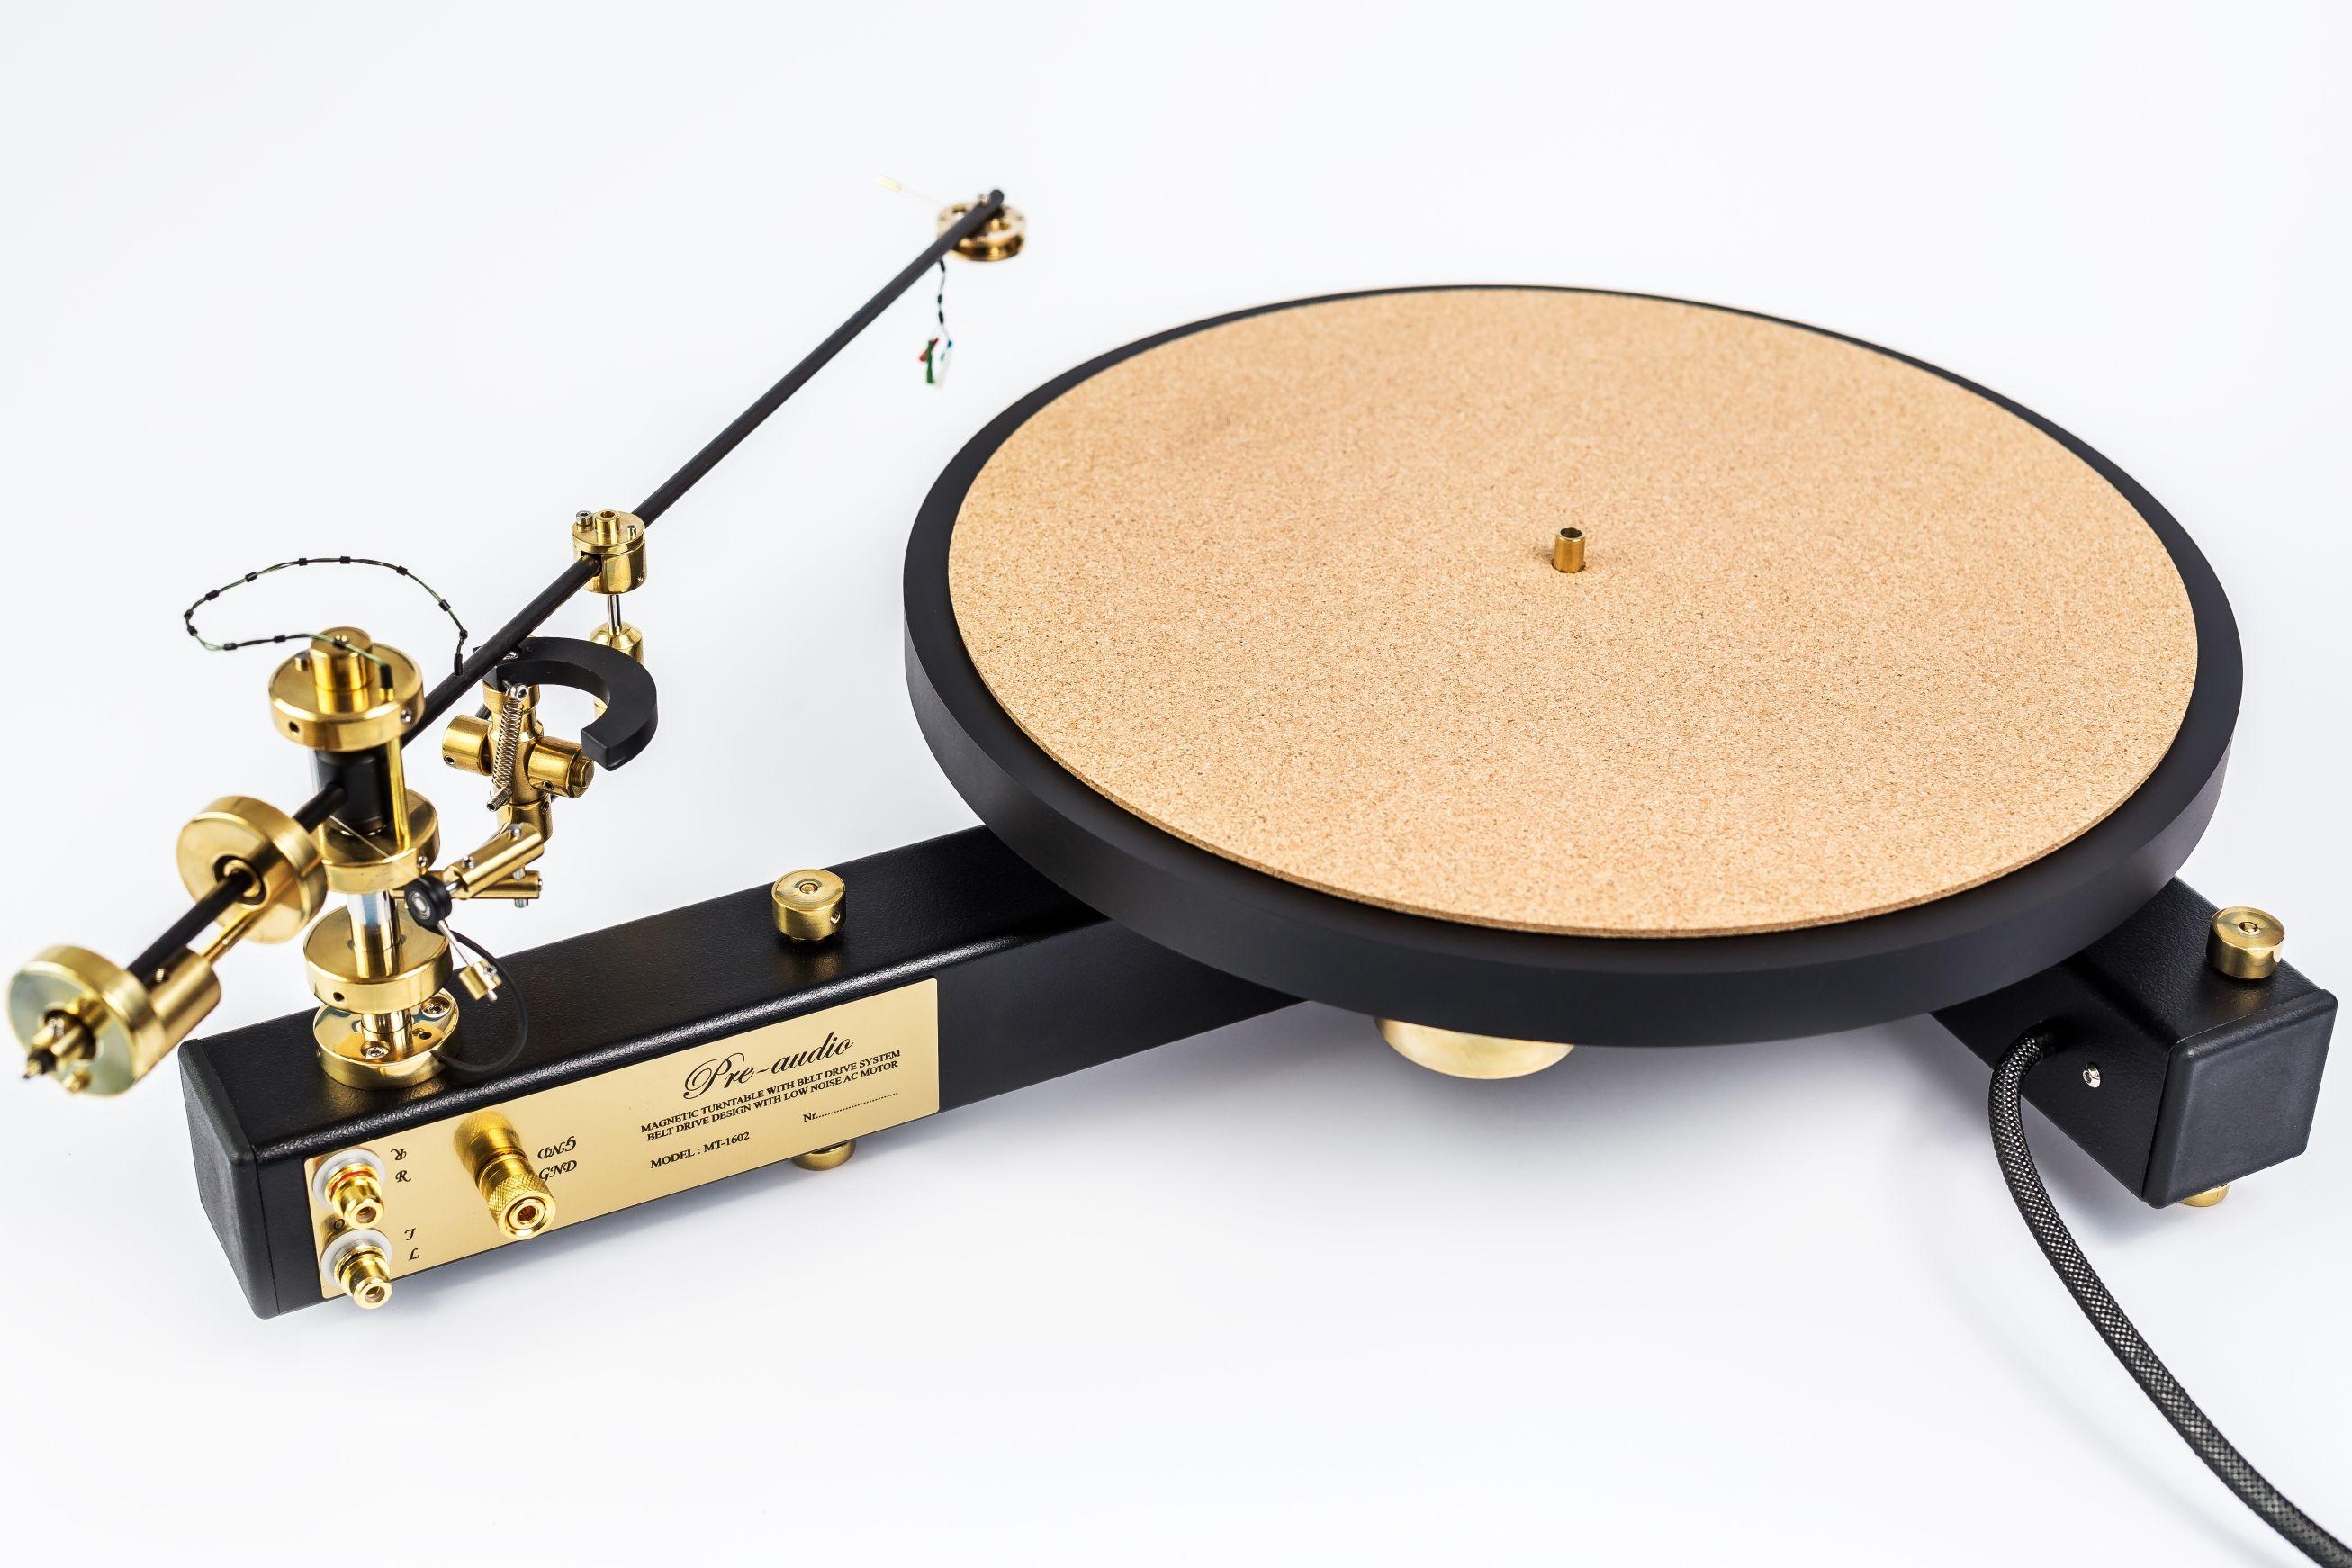 Gramophone Classic Mt 1602 Tonearm 12 Pre Audio Hifi Turntable High End Turntables Turntable